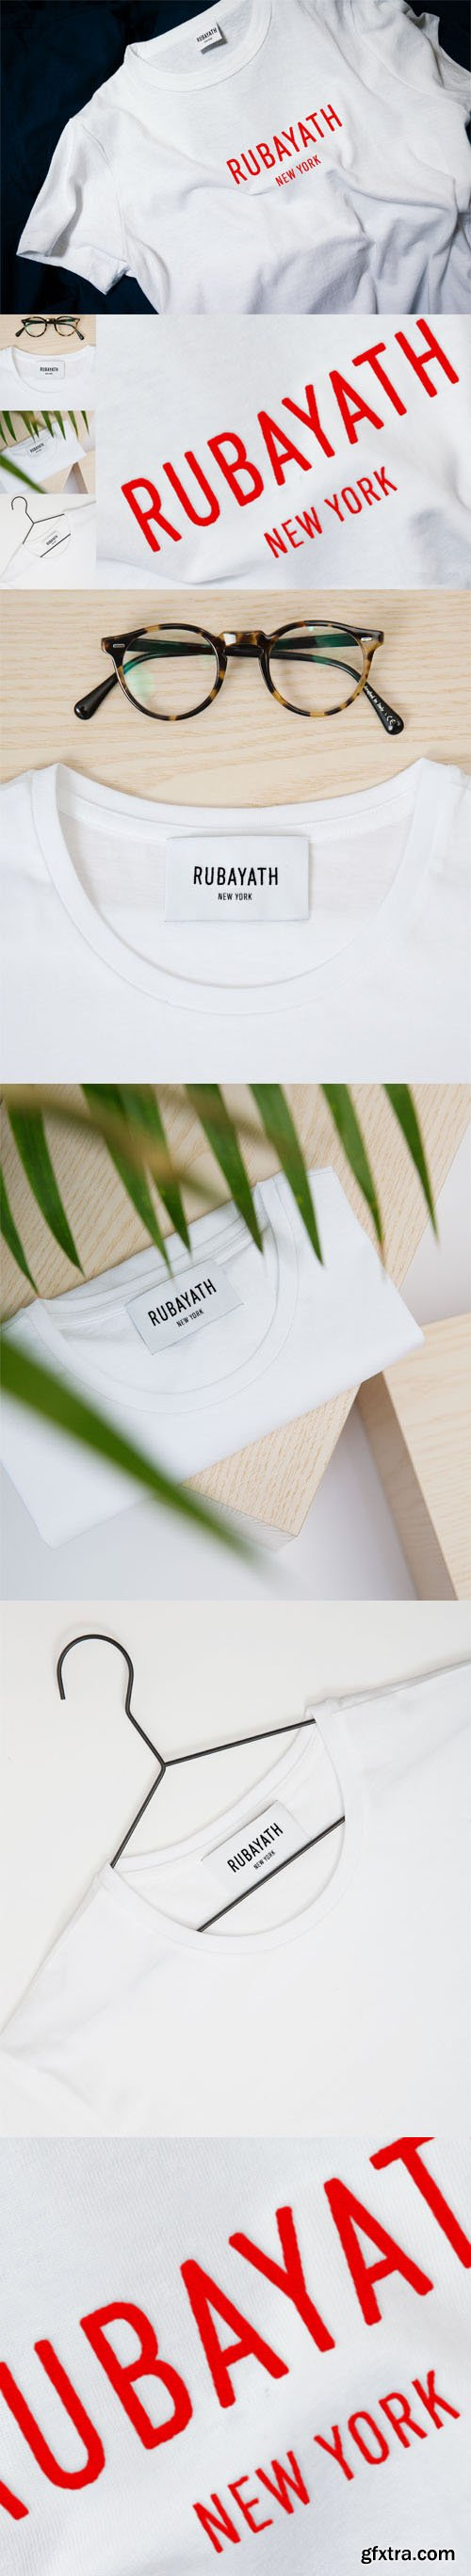 T-Shirt Stitched Logo & Tags PSD Mockup